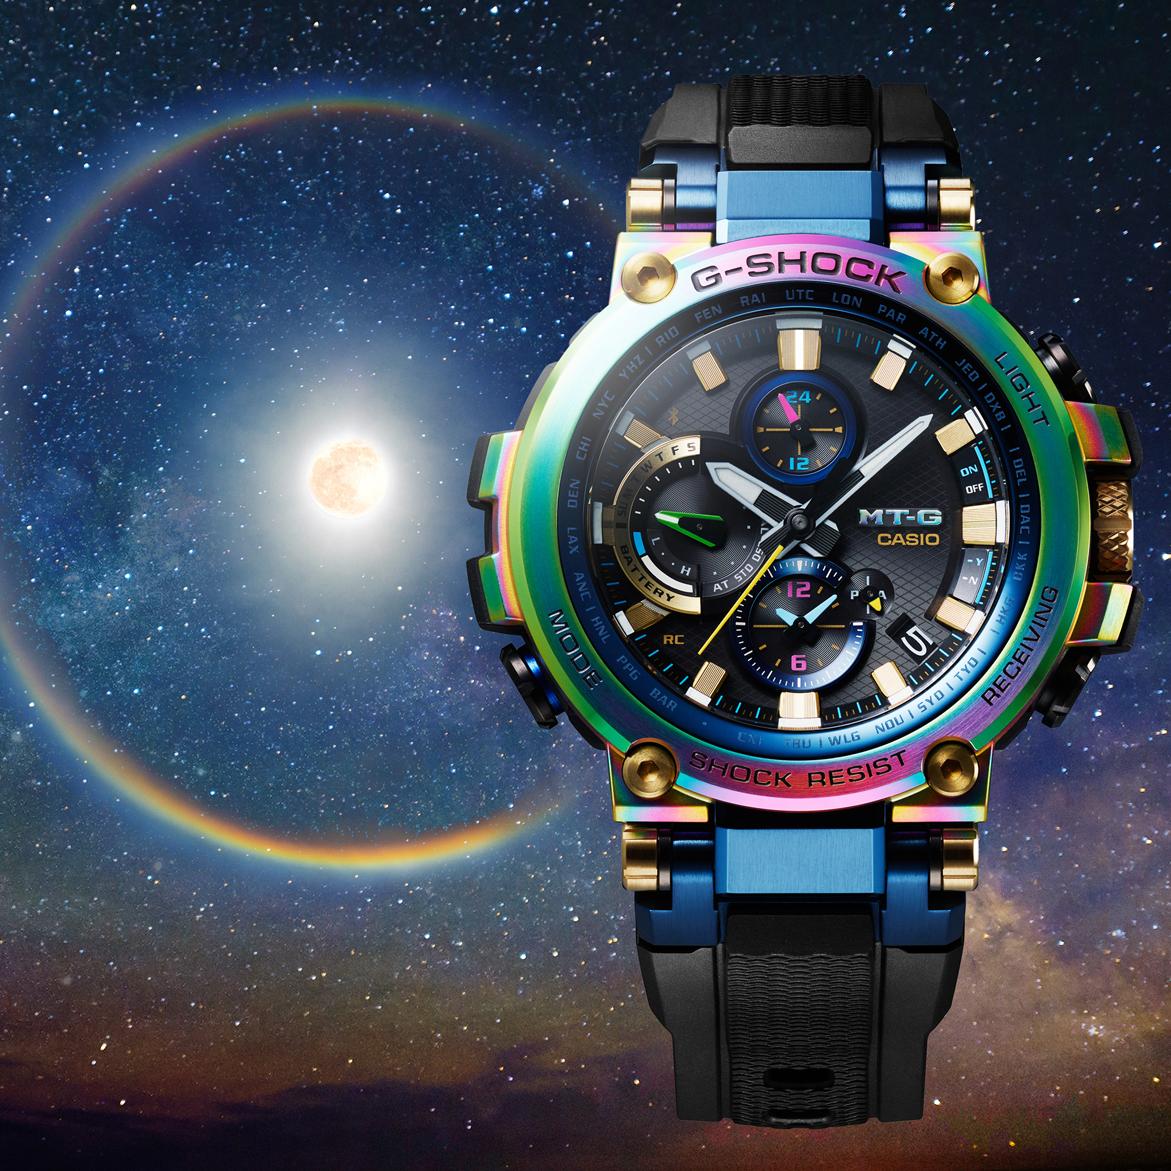 <p>CASIO MT-G 系列 20 週年紀念錶款 MTG-B1000RB</p>